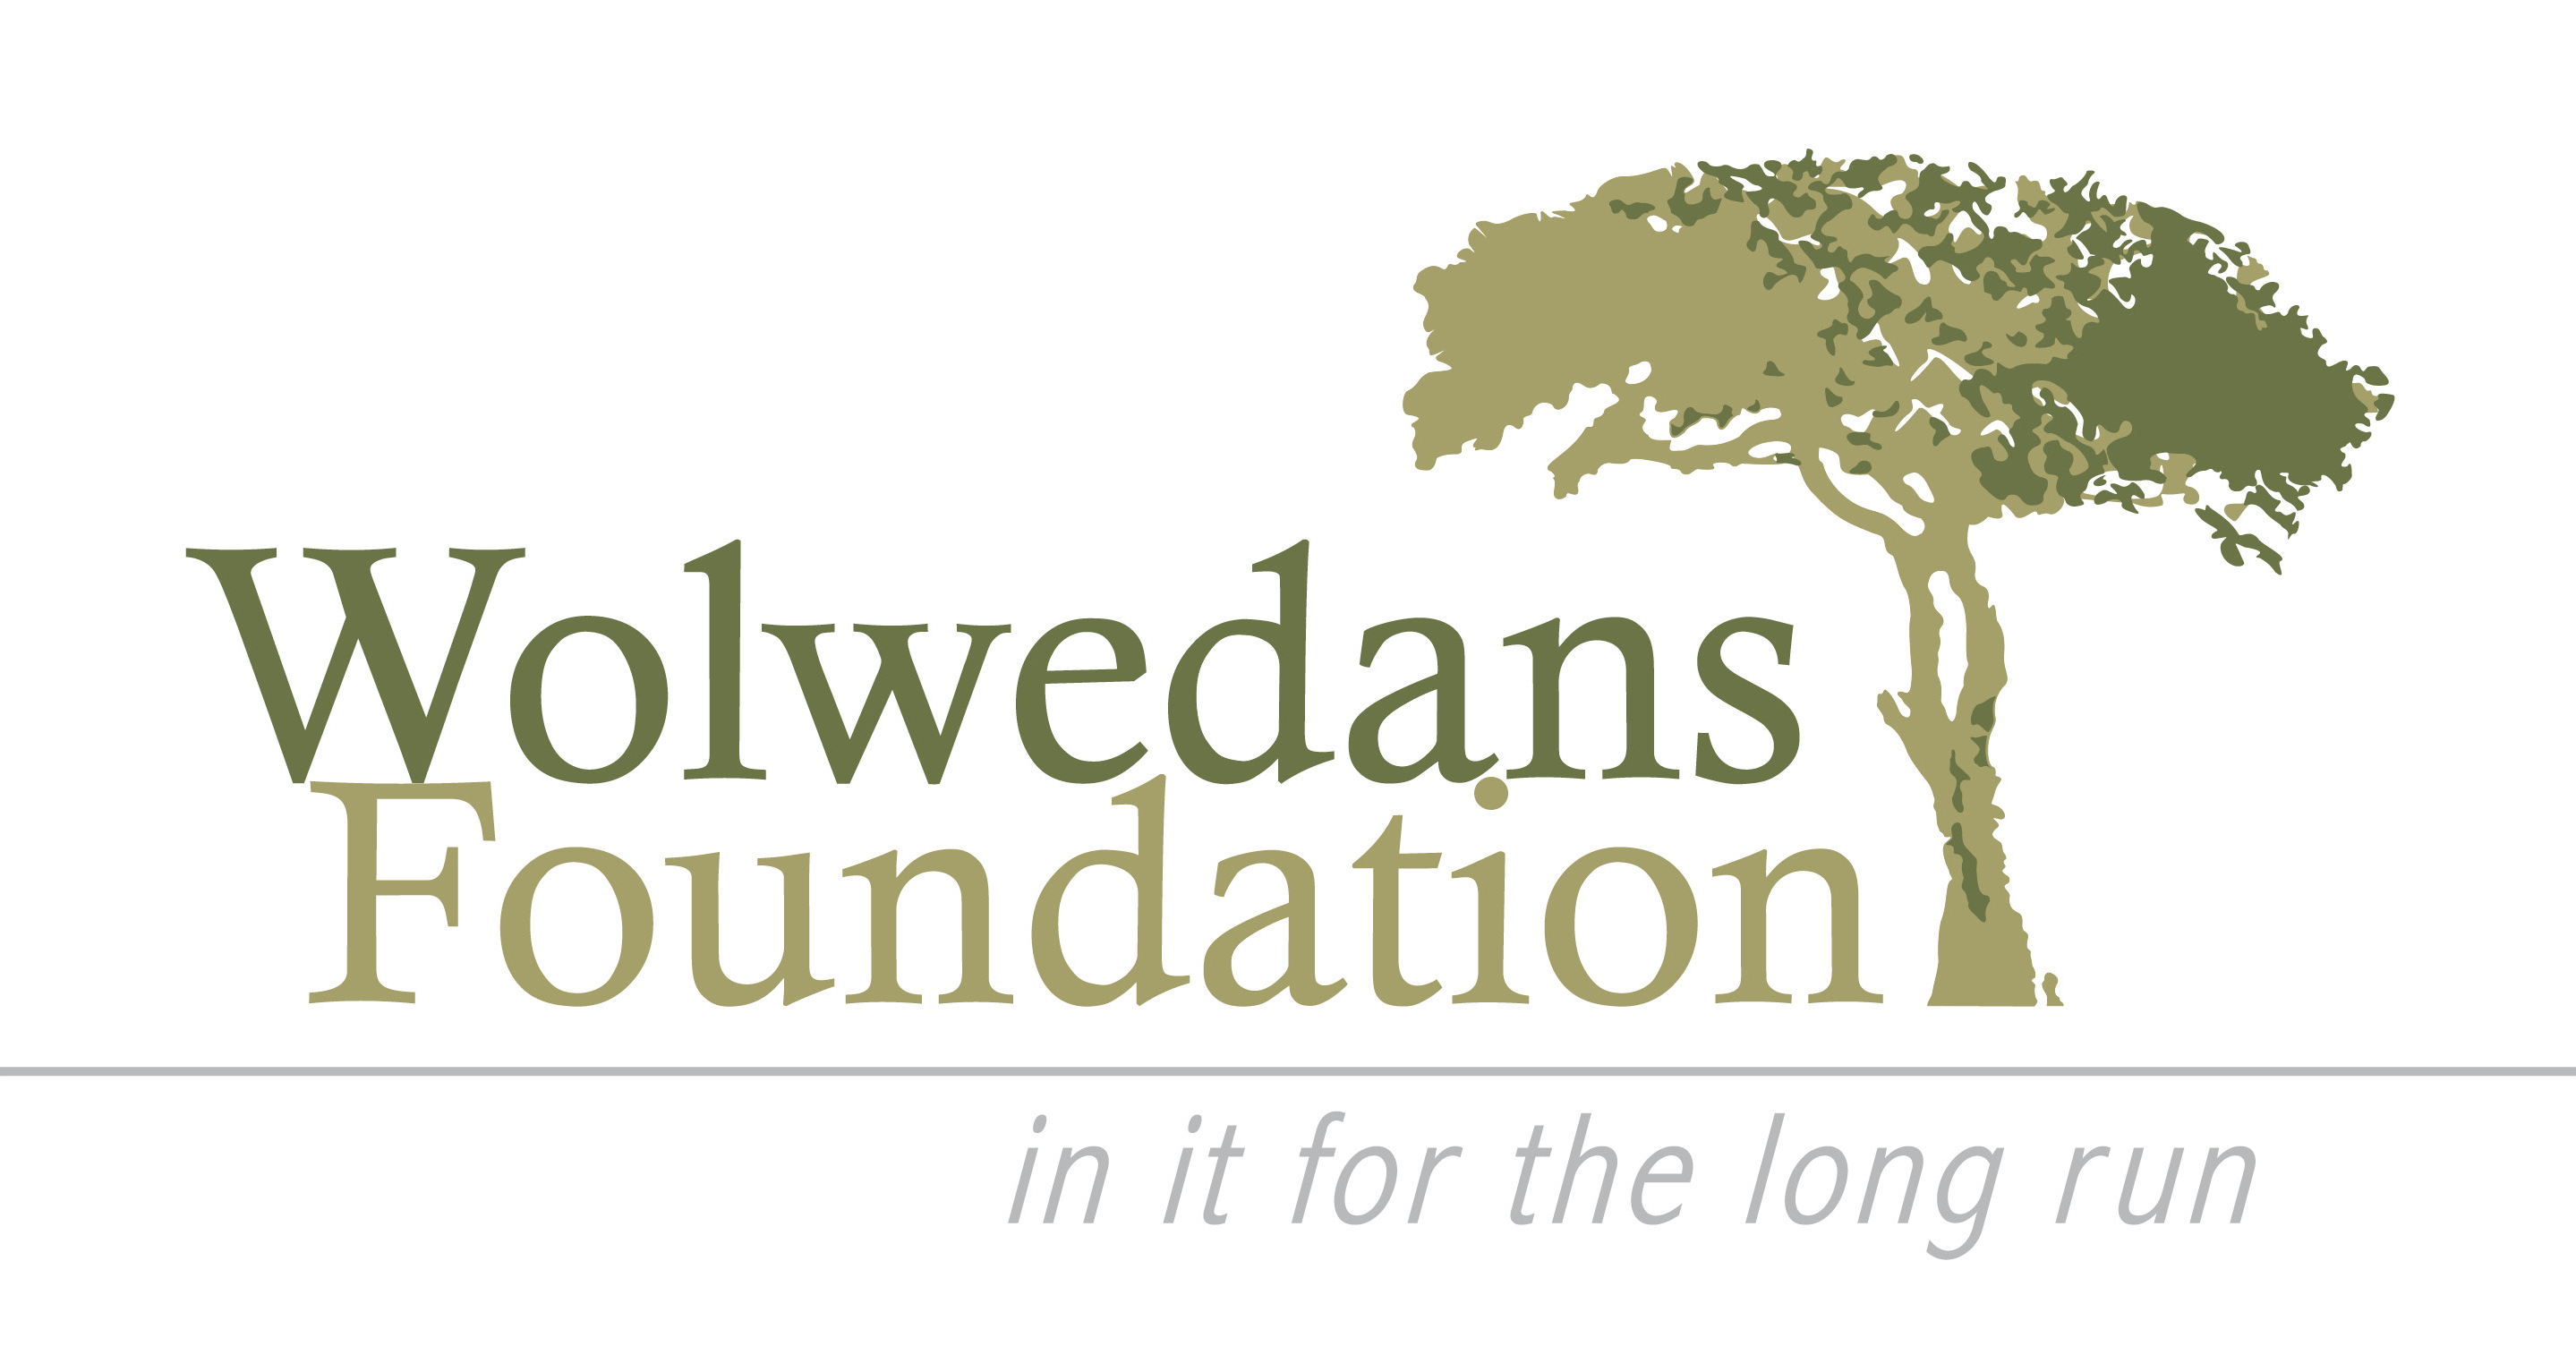 wolwedans foundation wolwedans desertacademy